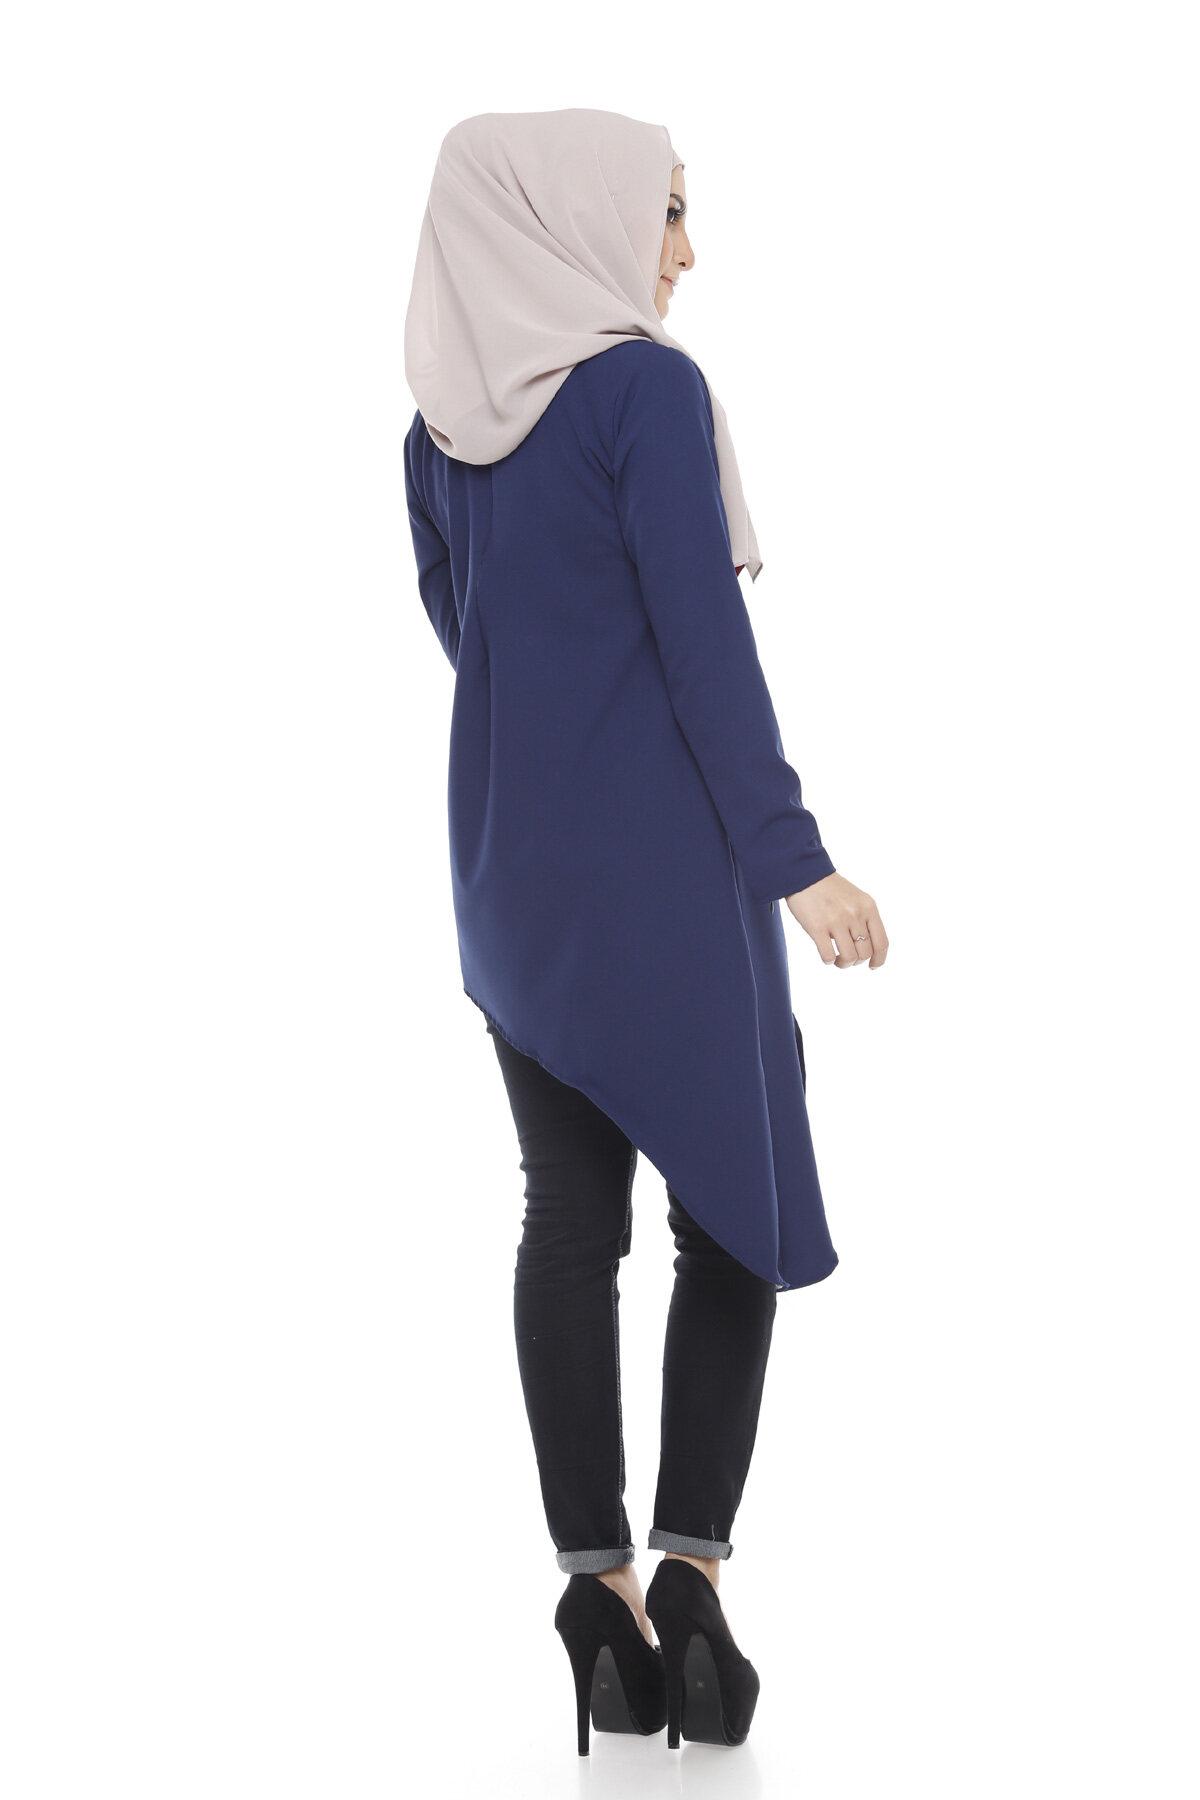 Murai Blouse Muslim Women Fashion Muslimah Baju Blouse Plus Size (2XL-5XL) / Murah / Ready Stock / Raya 2021